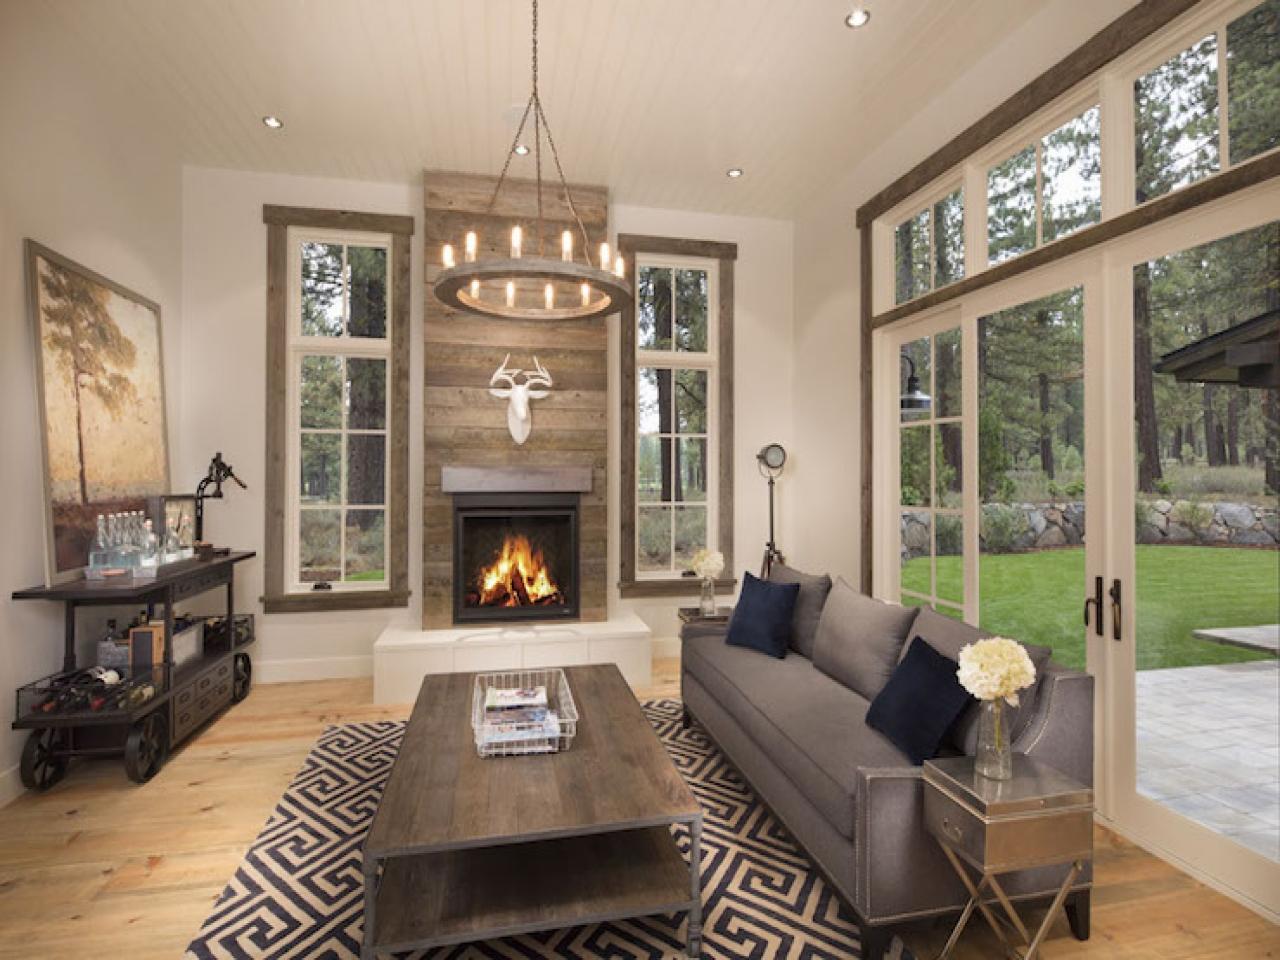 Fullsize Of Rustic Living Room